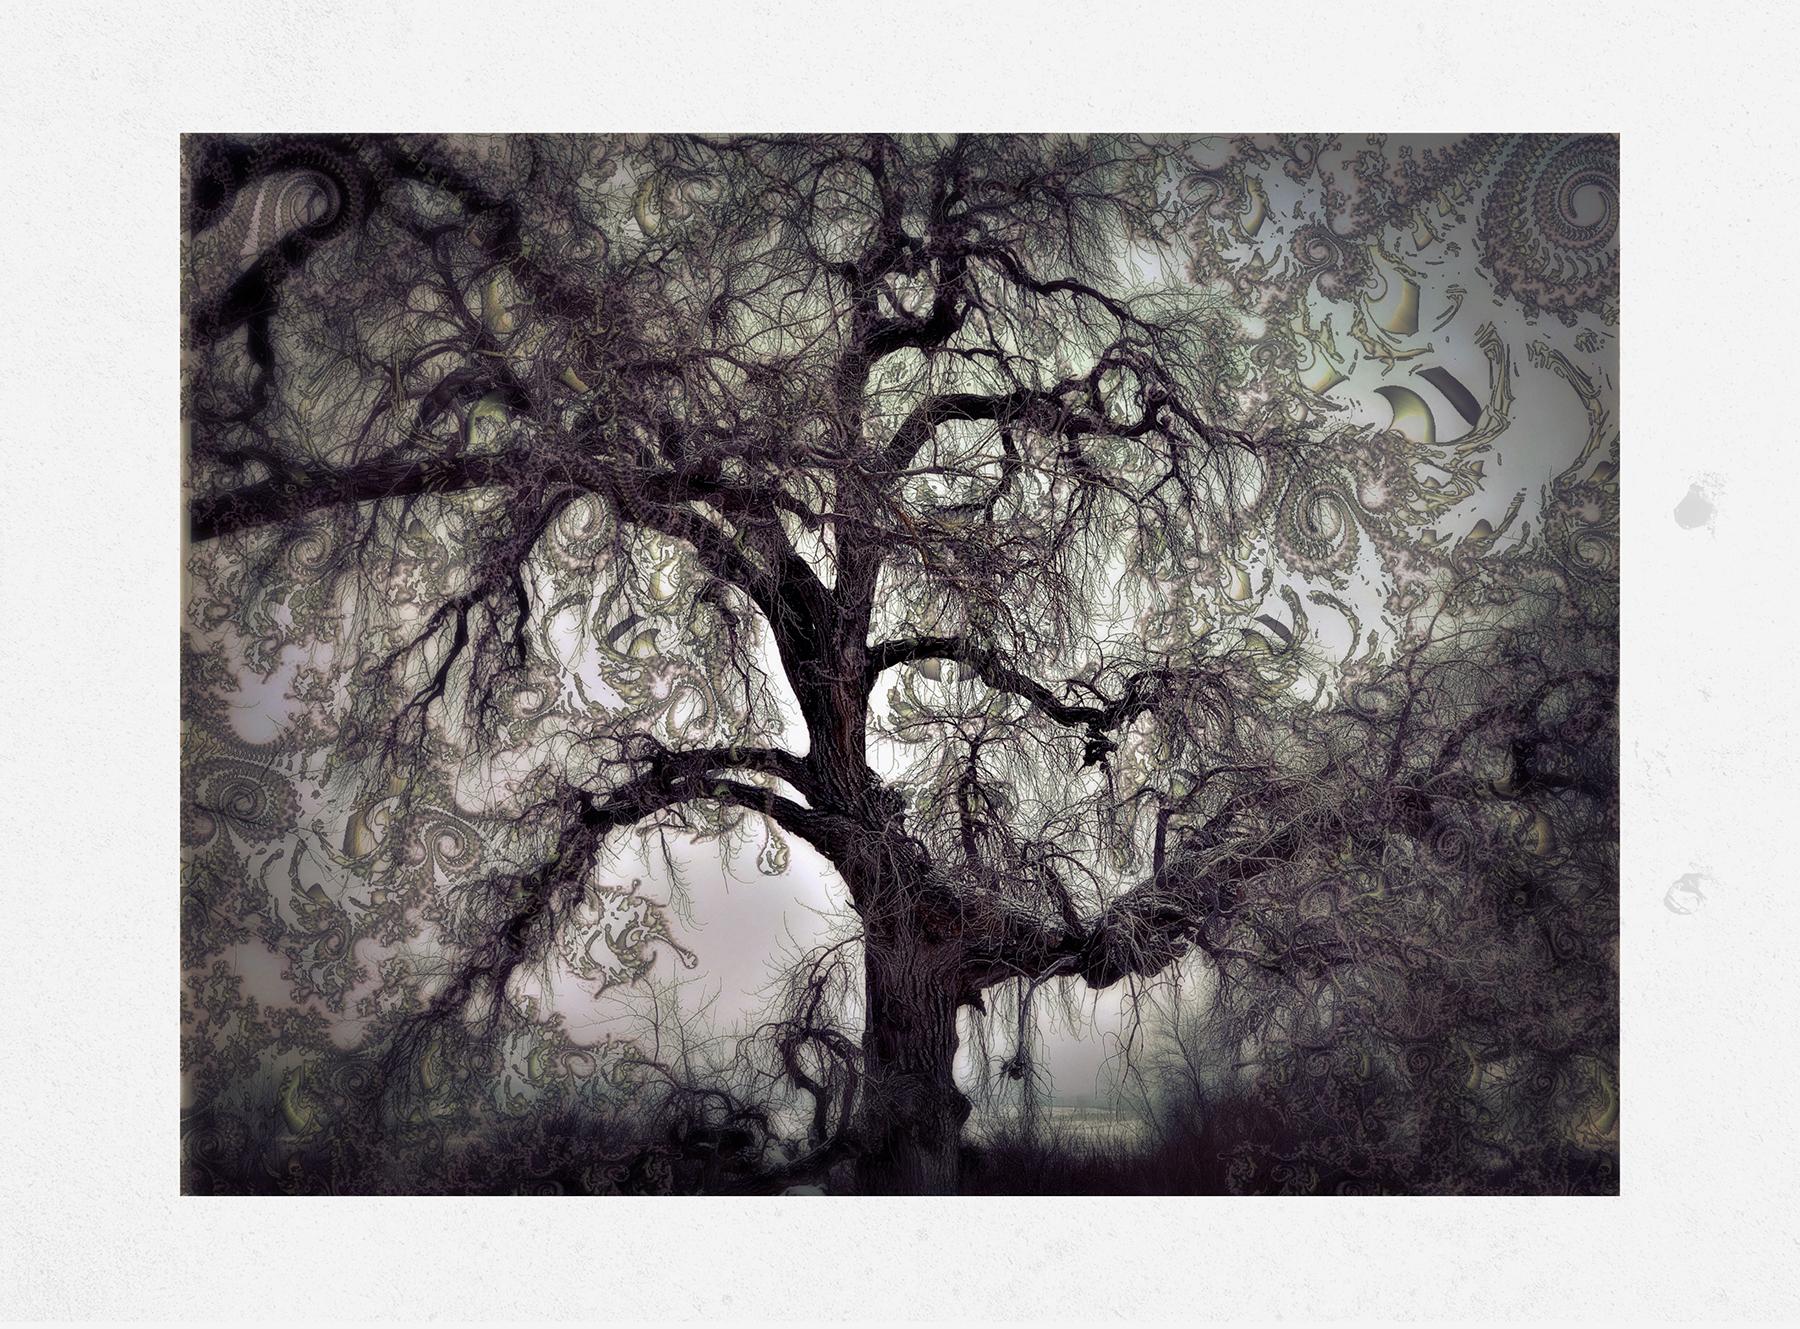 Kate_Zari Roberts_Nature Fractala_Tree Fractal_2.jpg